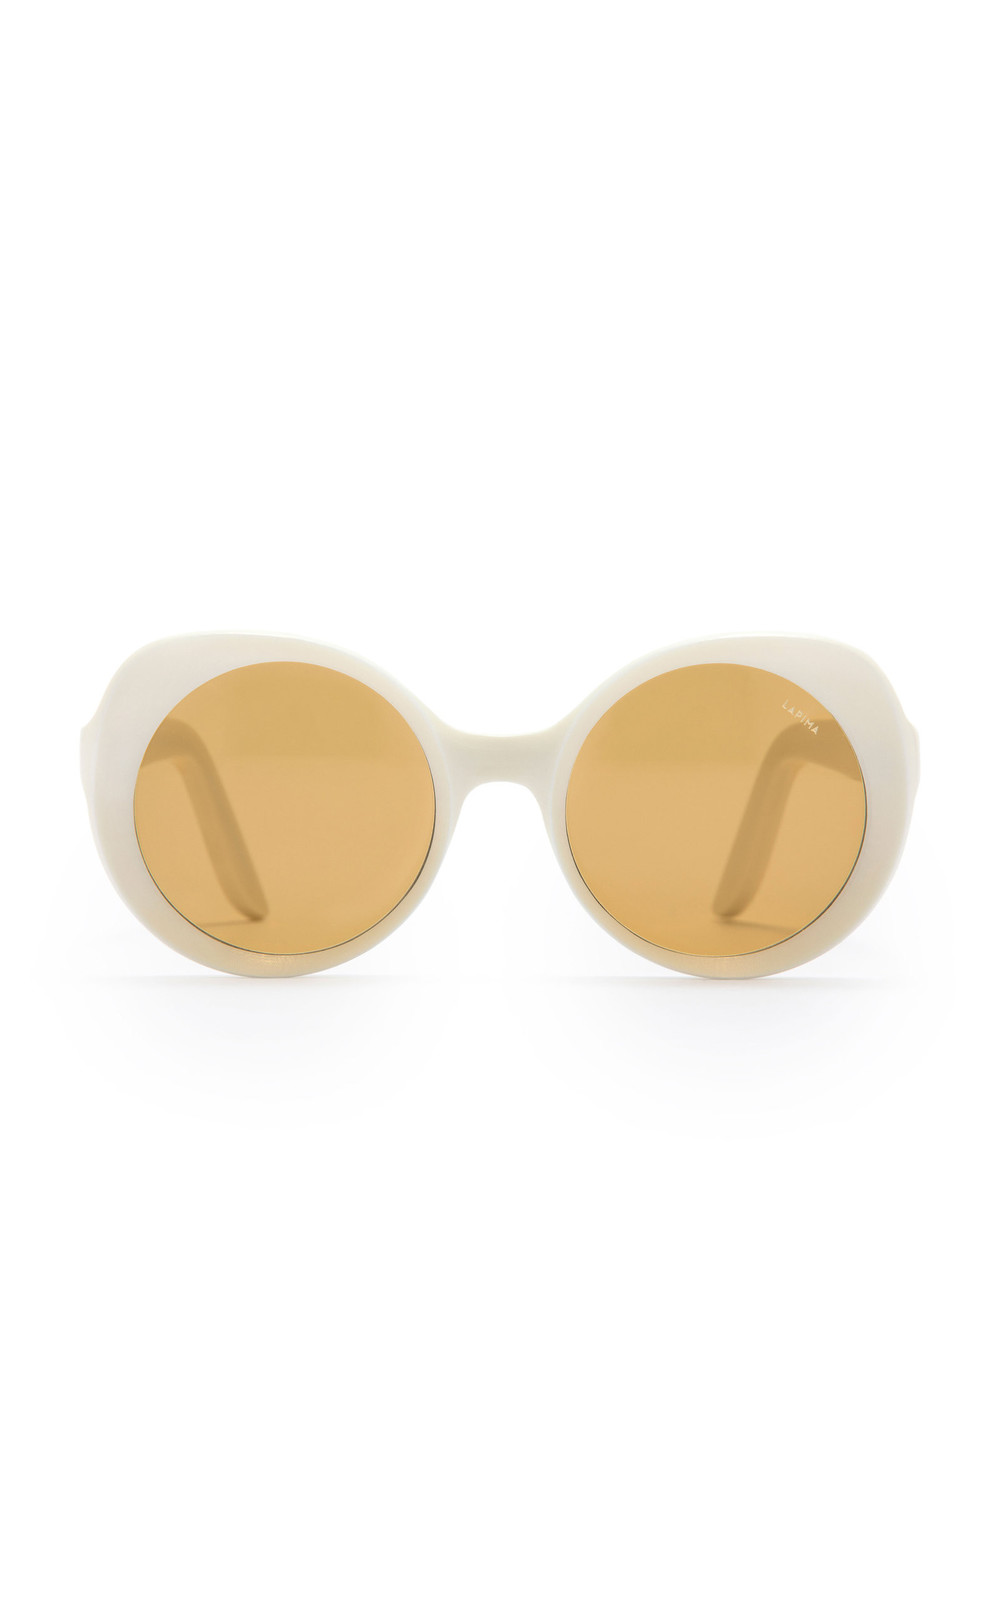 Lapima Carlota Round-Frame Acetate Sunglasses in white